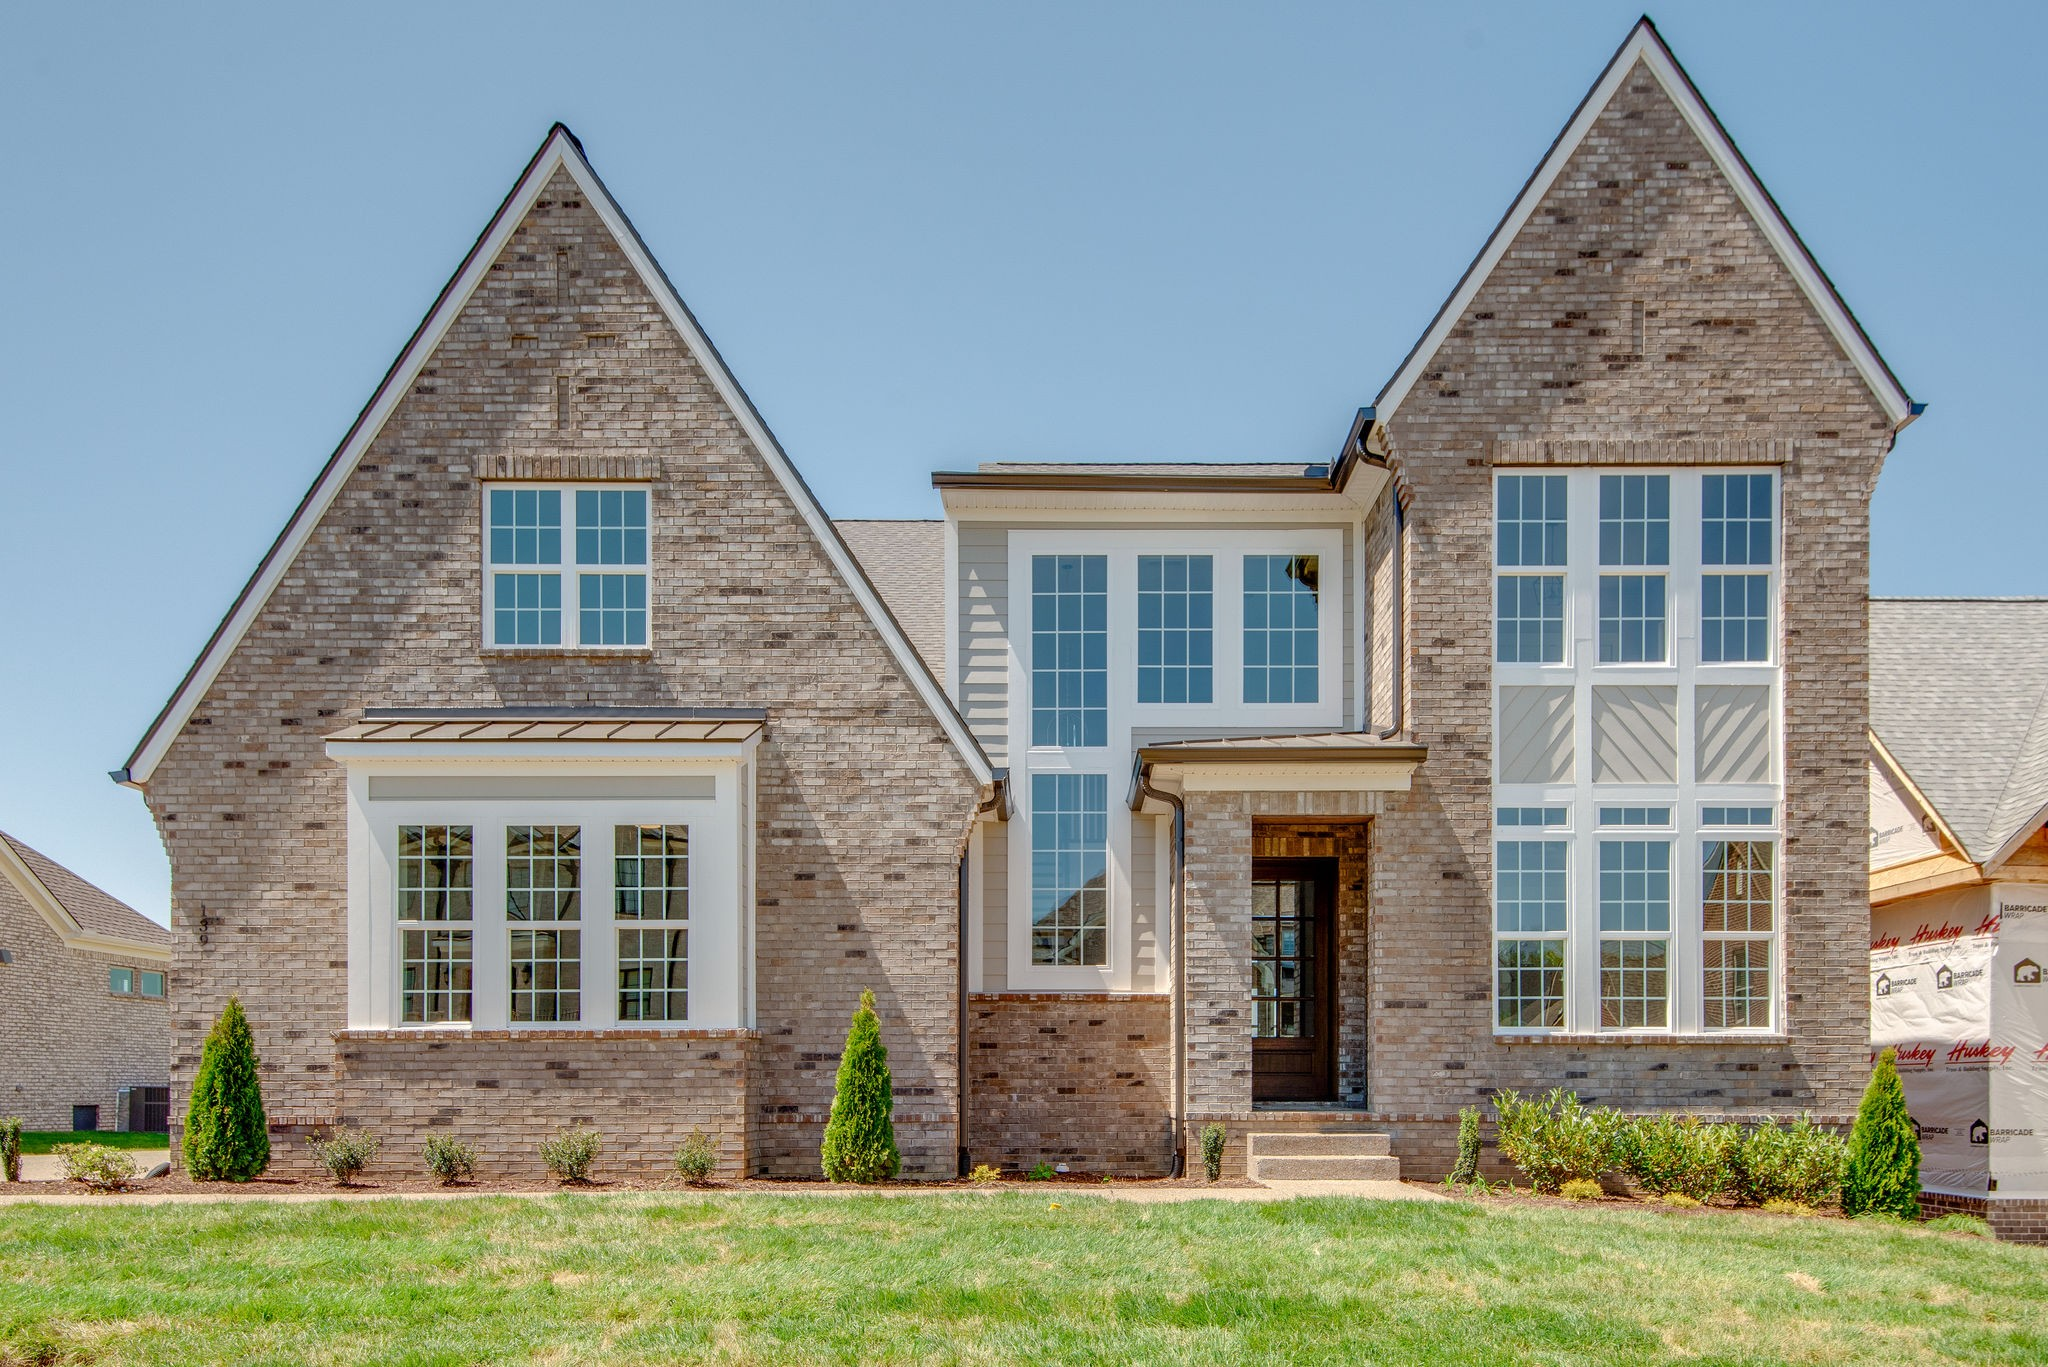 139 Telfair Ln Lot 9, Nolensville, TN 37135 - Nolensville, TN real estate listing